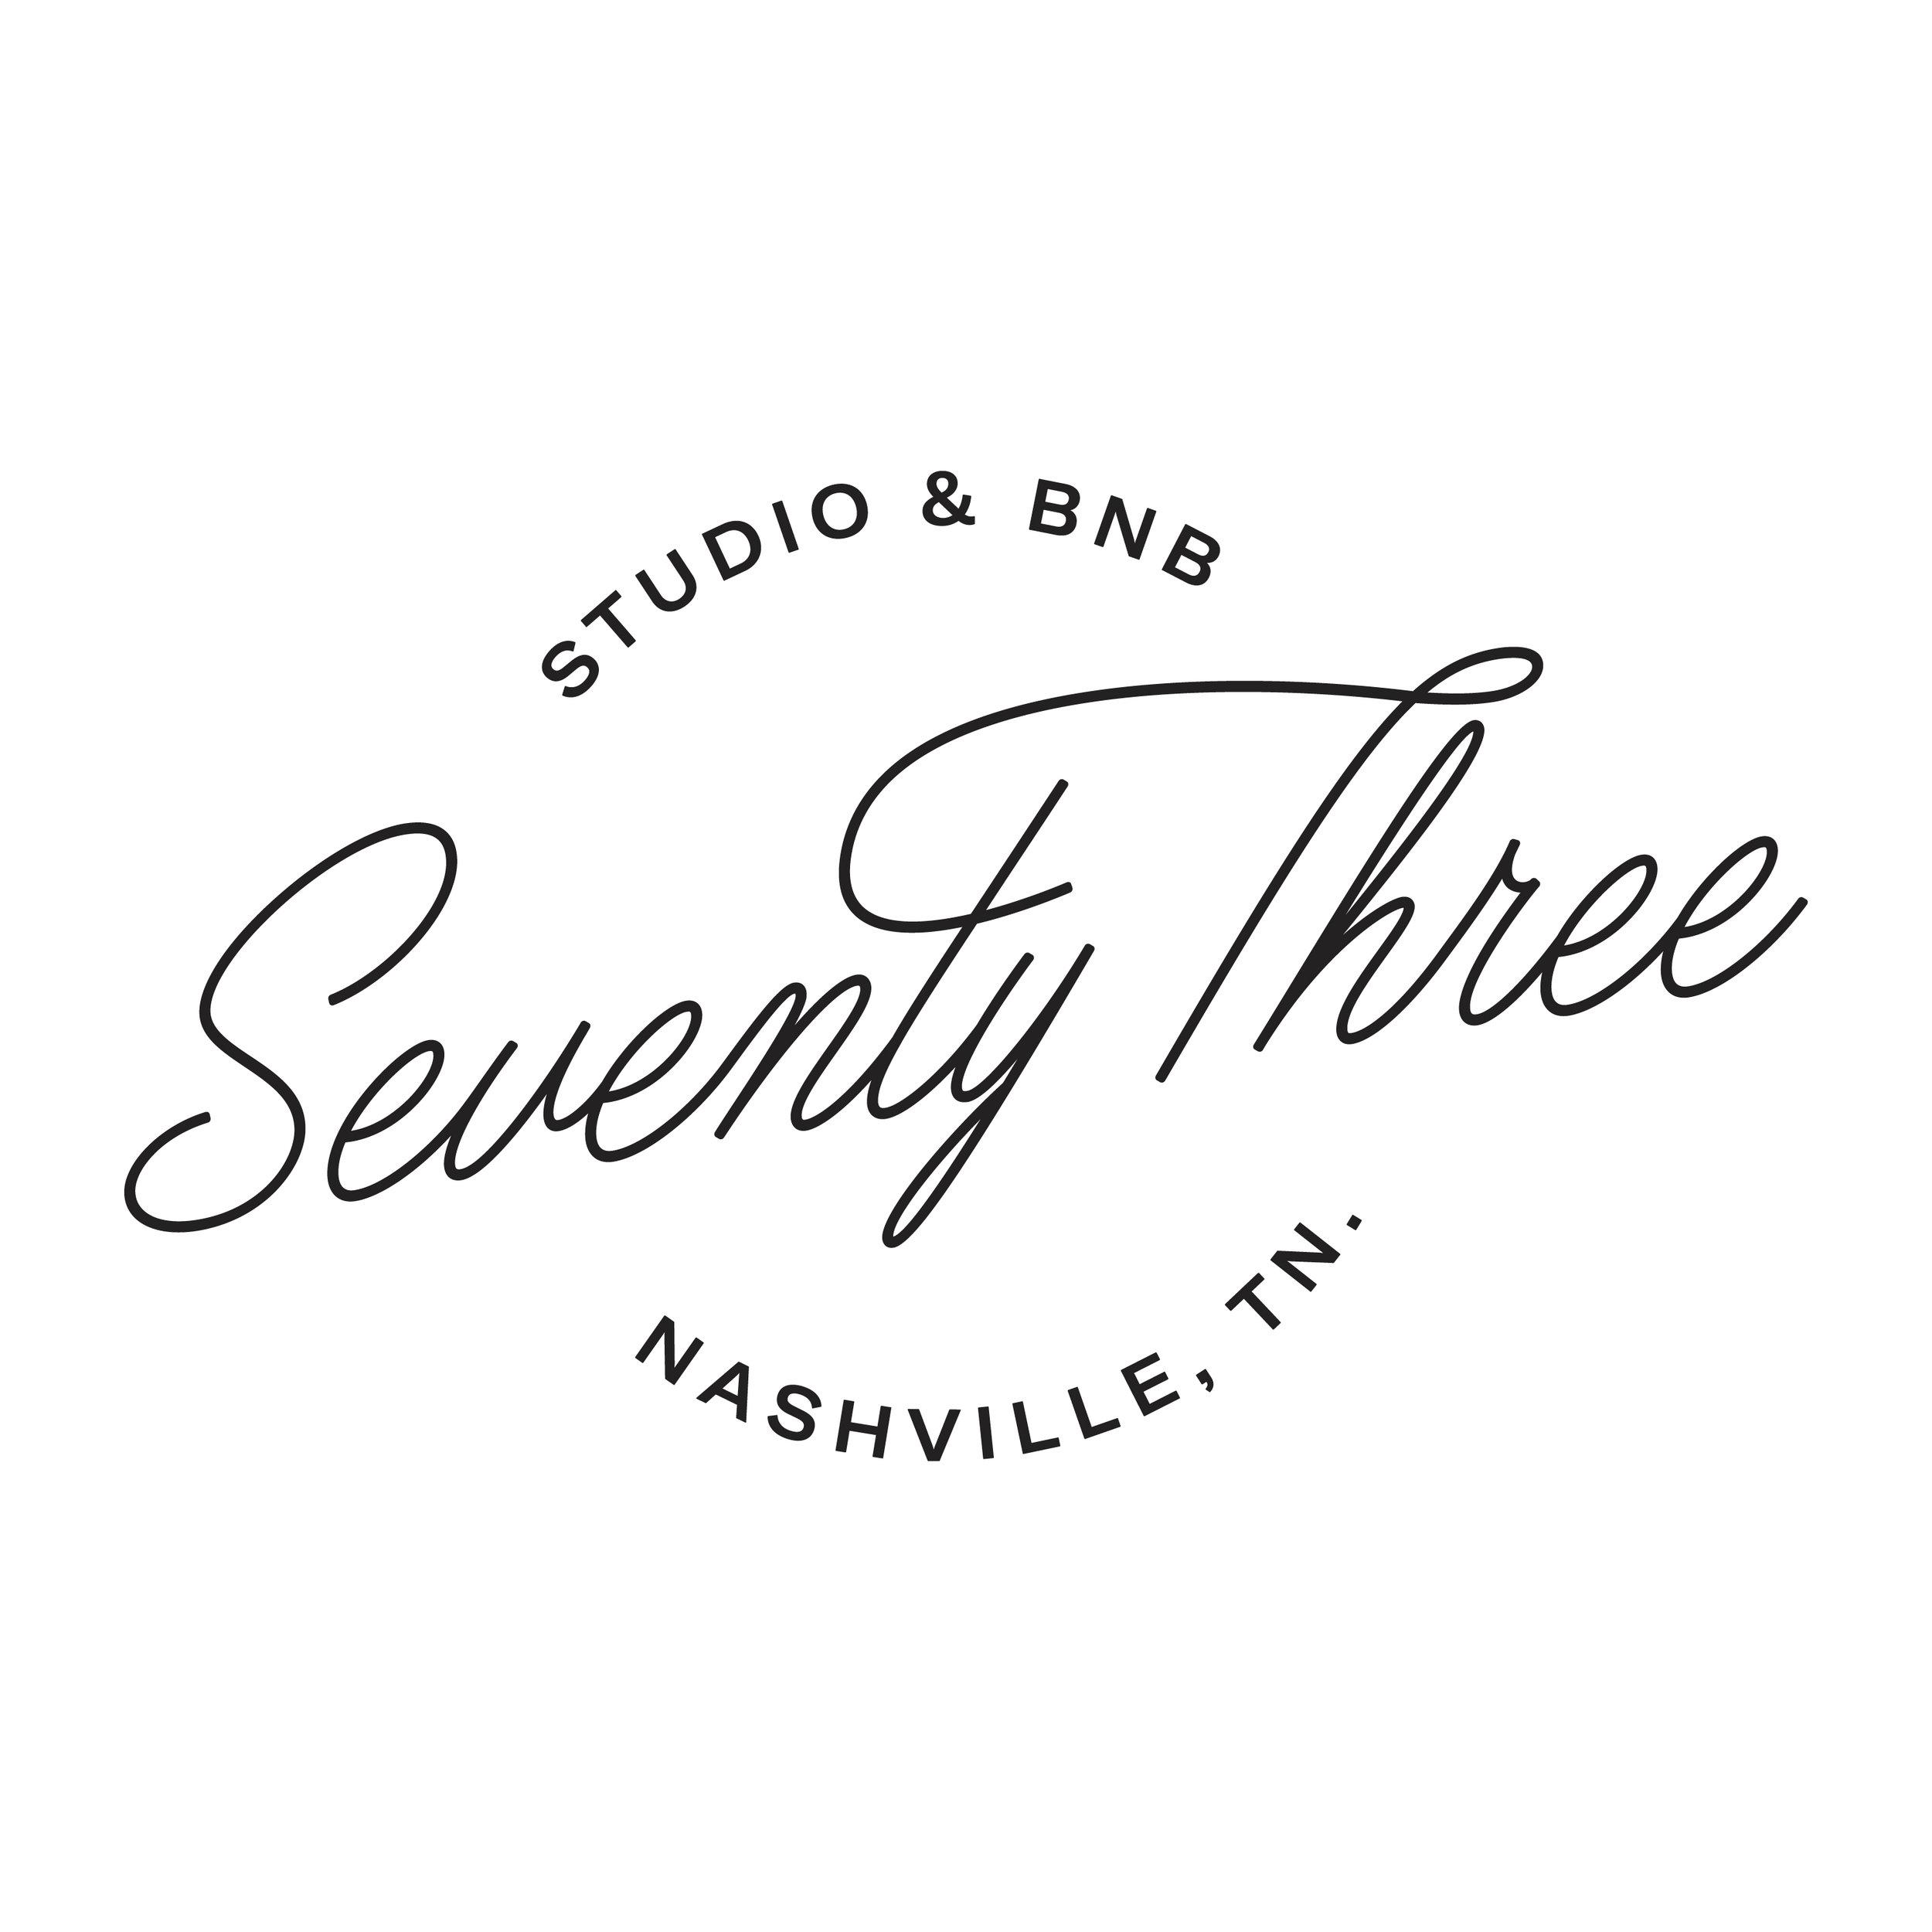 SeventyThree_Logo-01.jpg